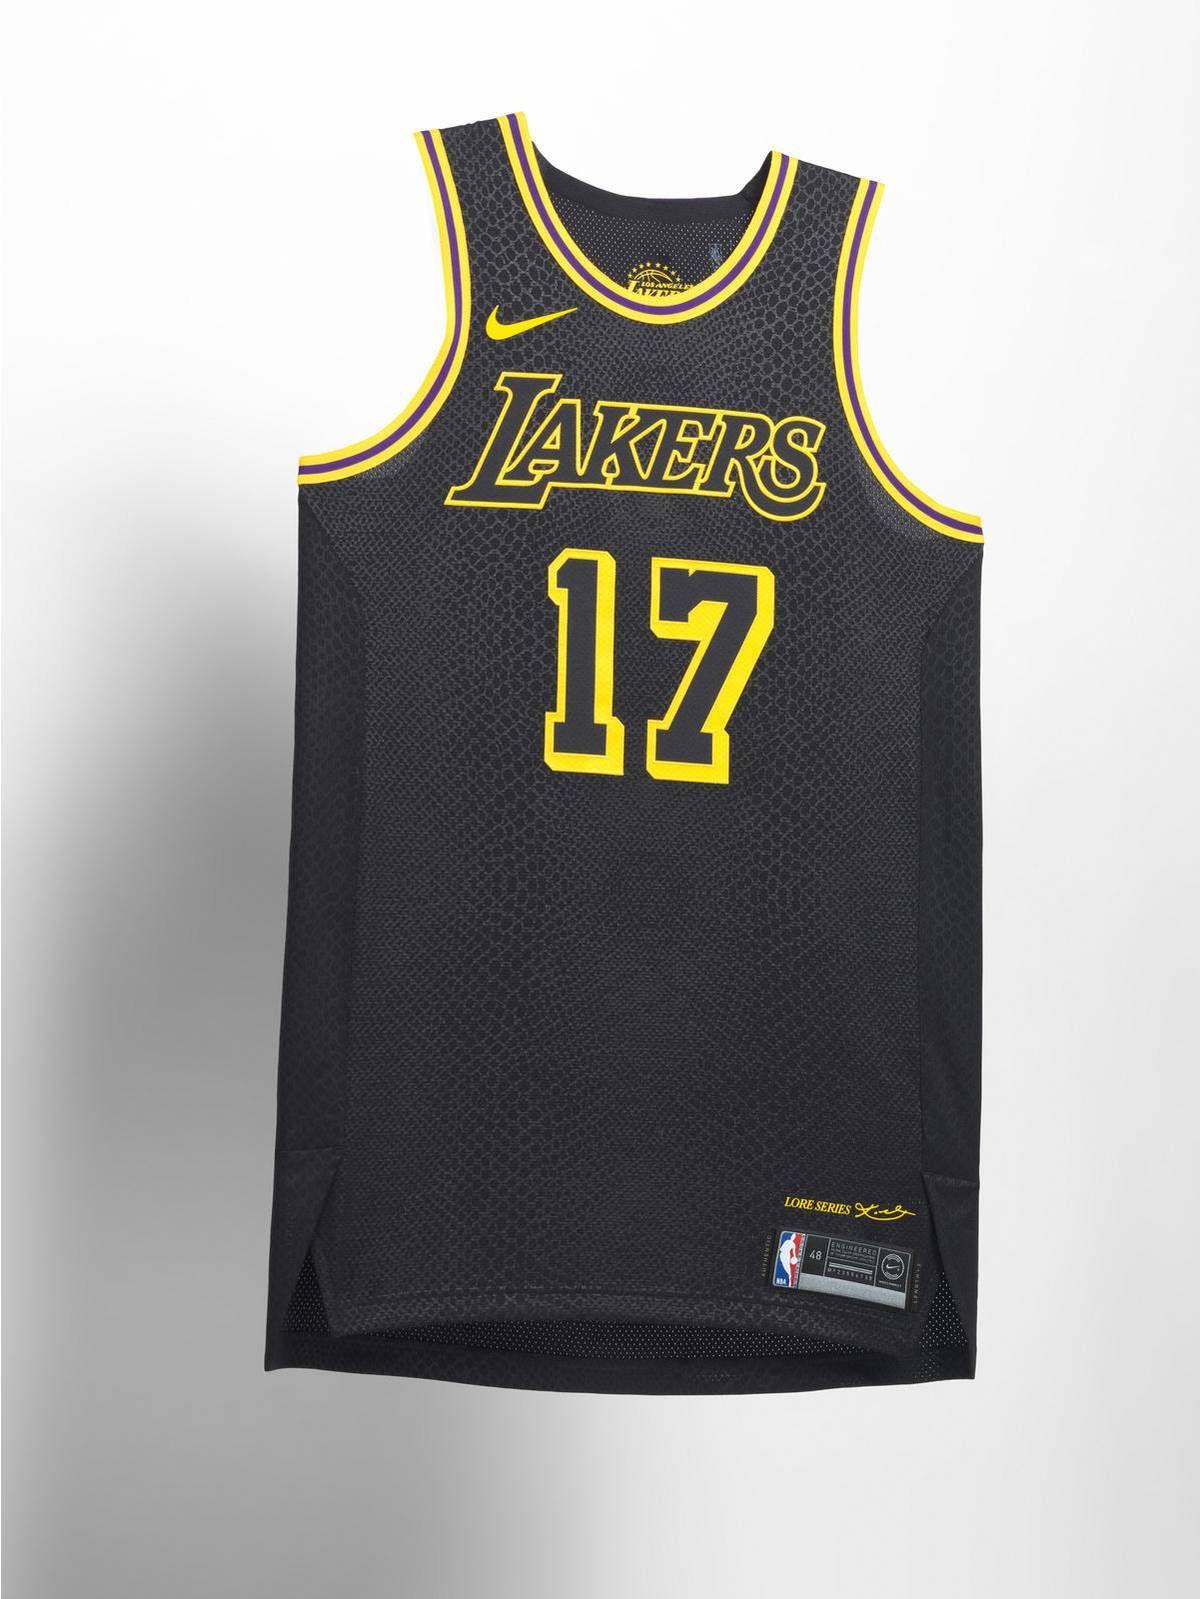 Look Nike City Edition Jerseys Revealed Nba Uniforms Basketball Uniforms Design Basketball Uniforms